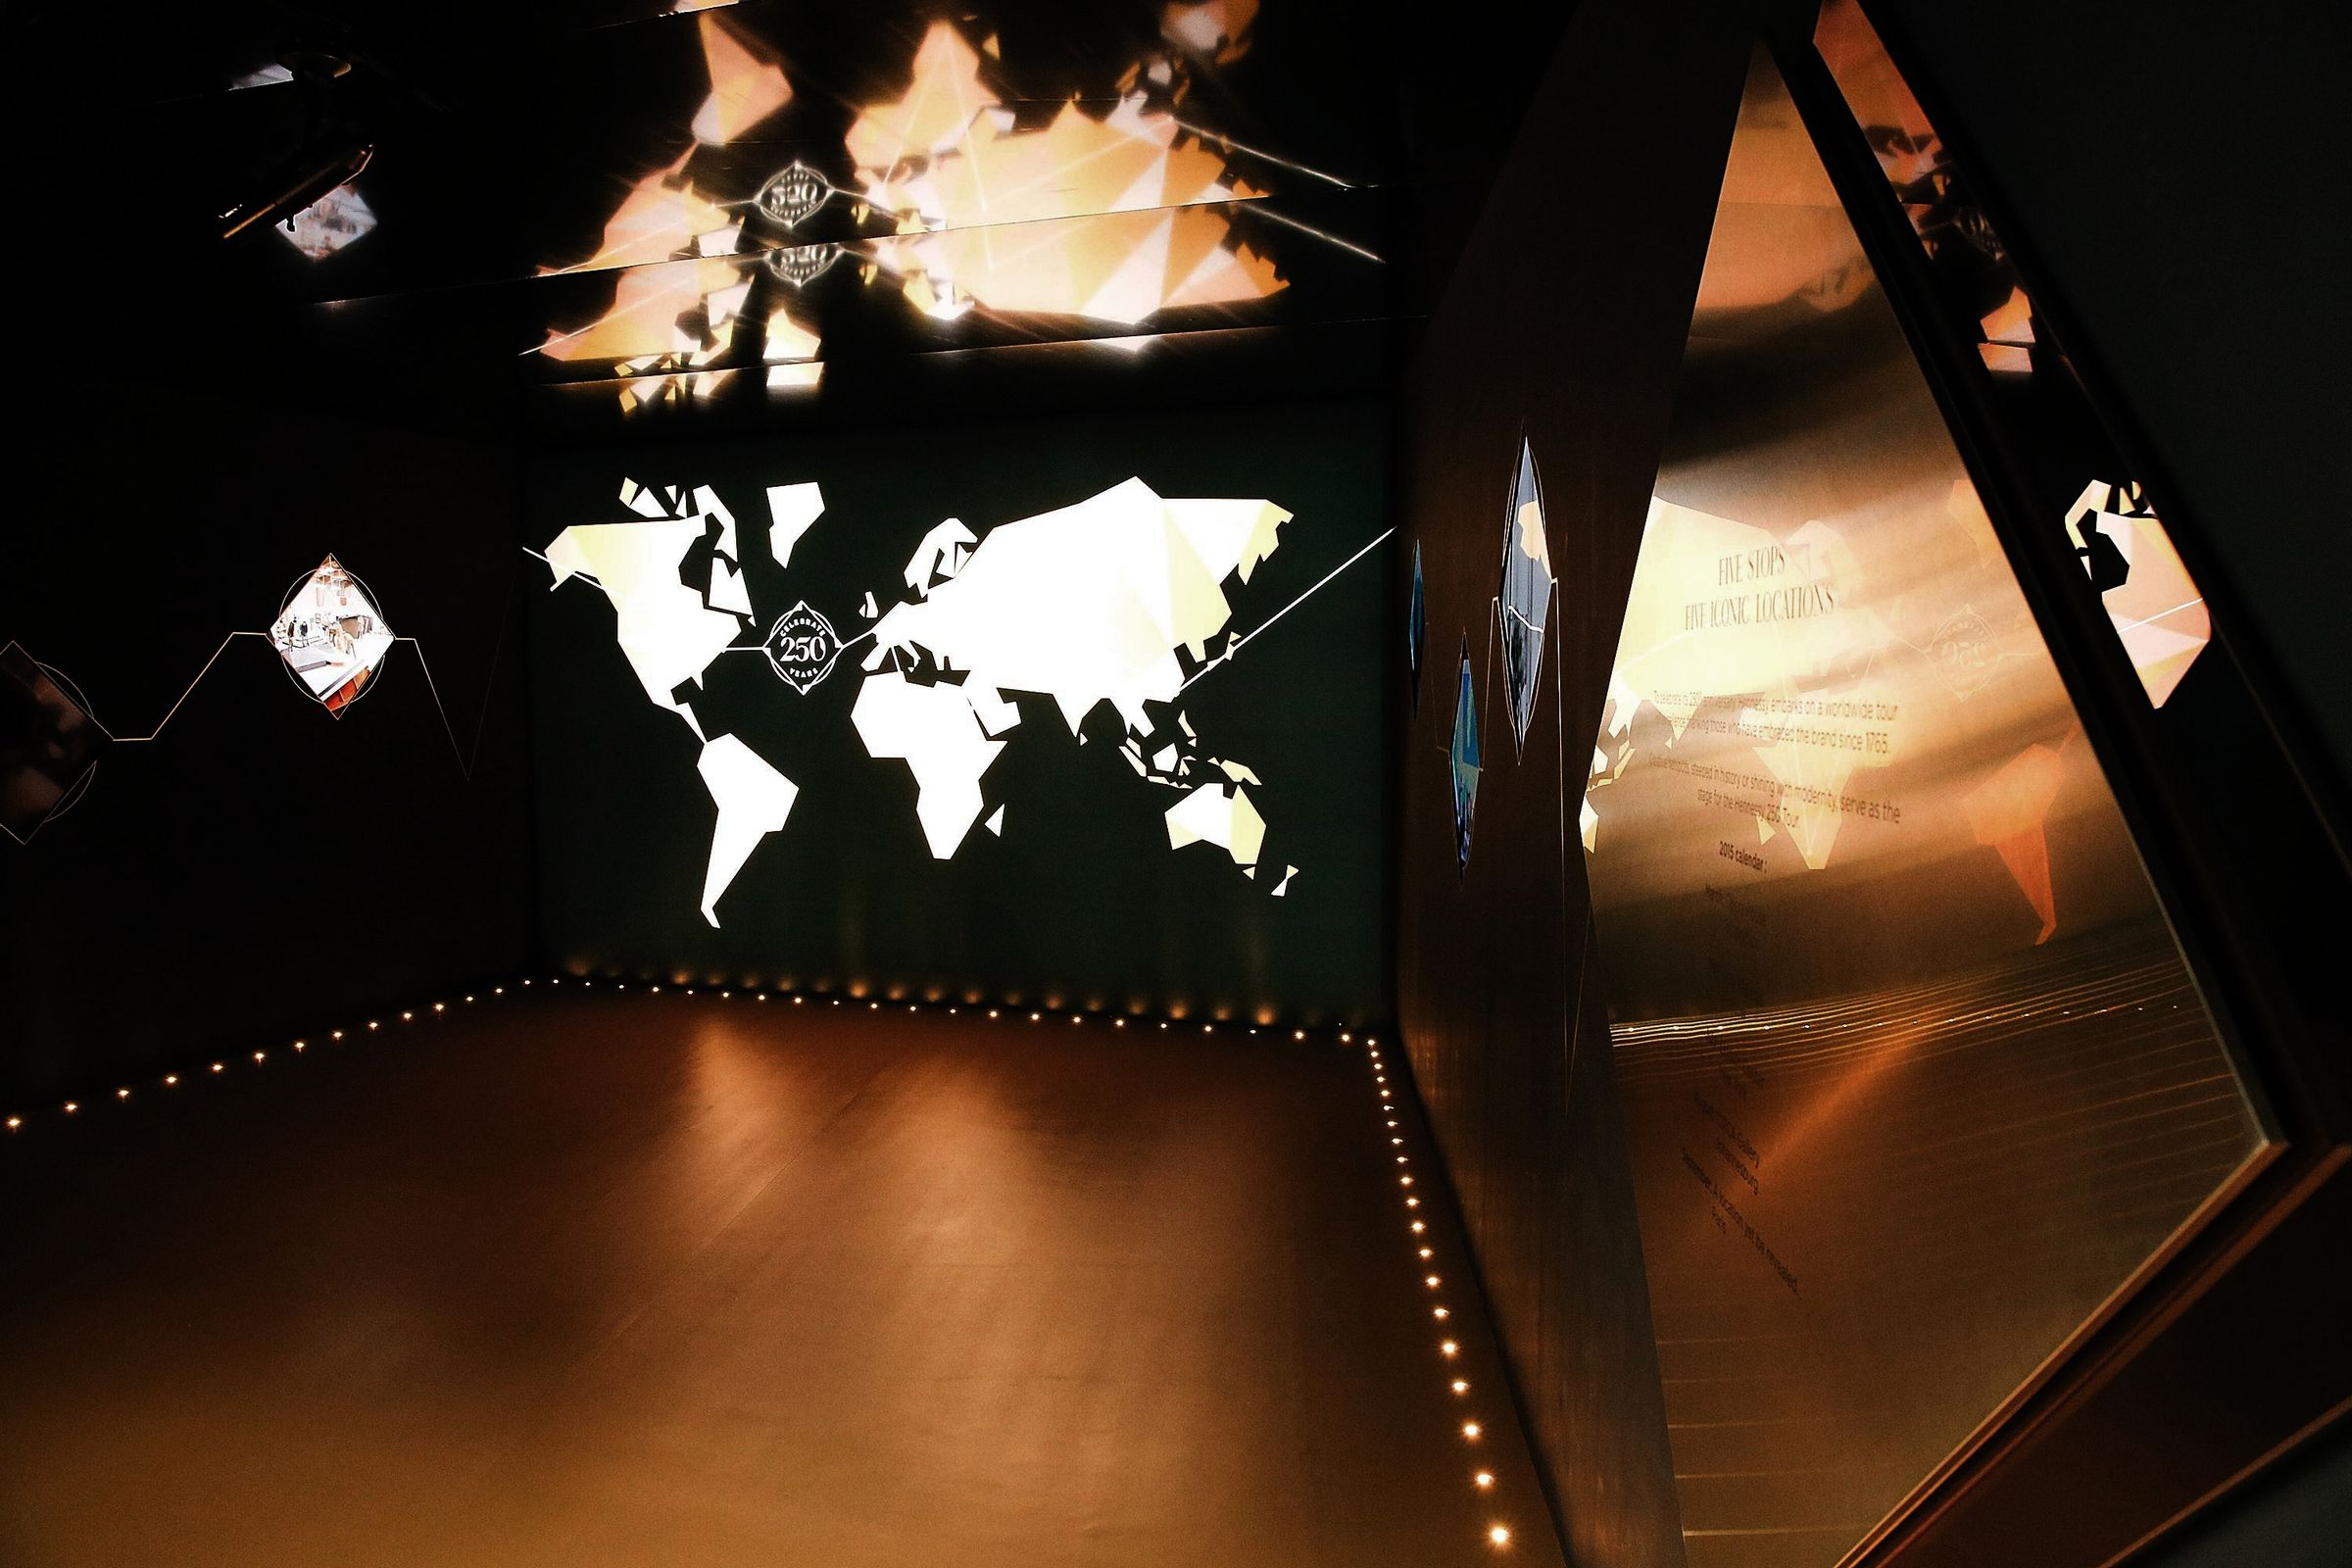 Hennessy 250th anniversary tour installation